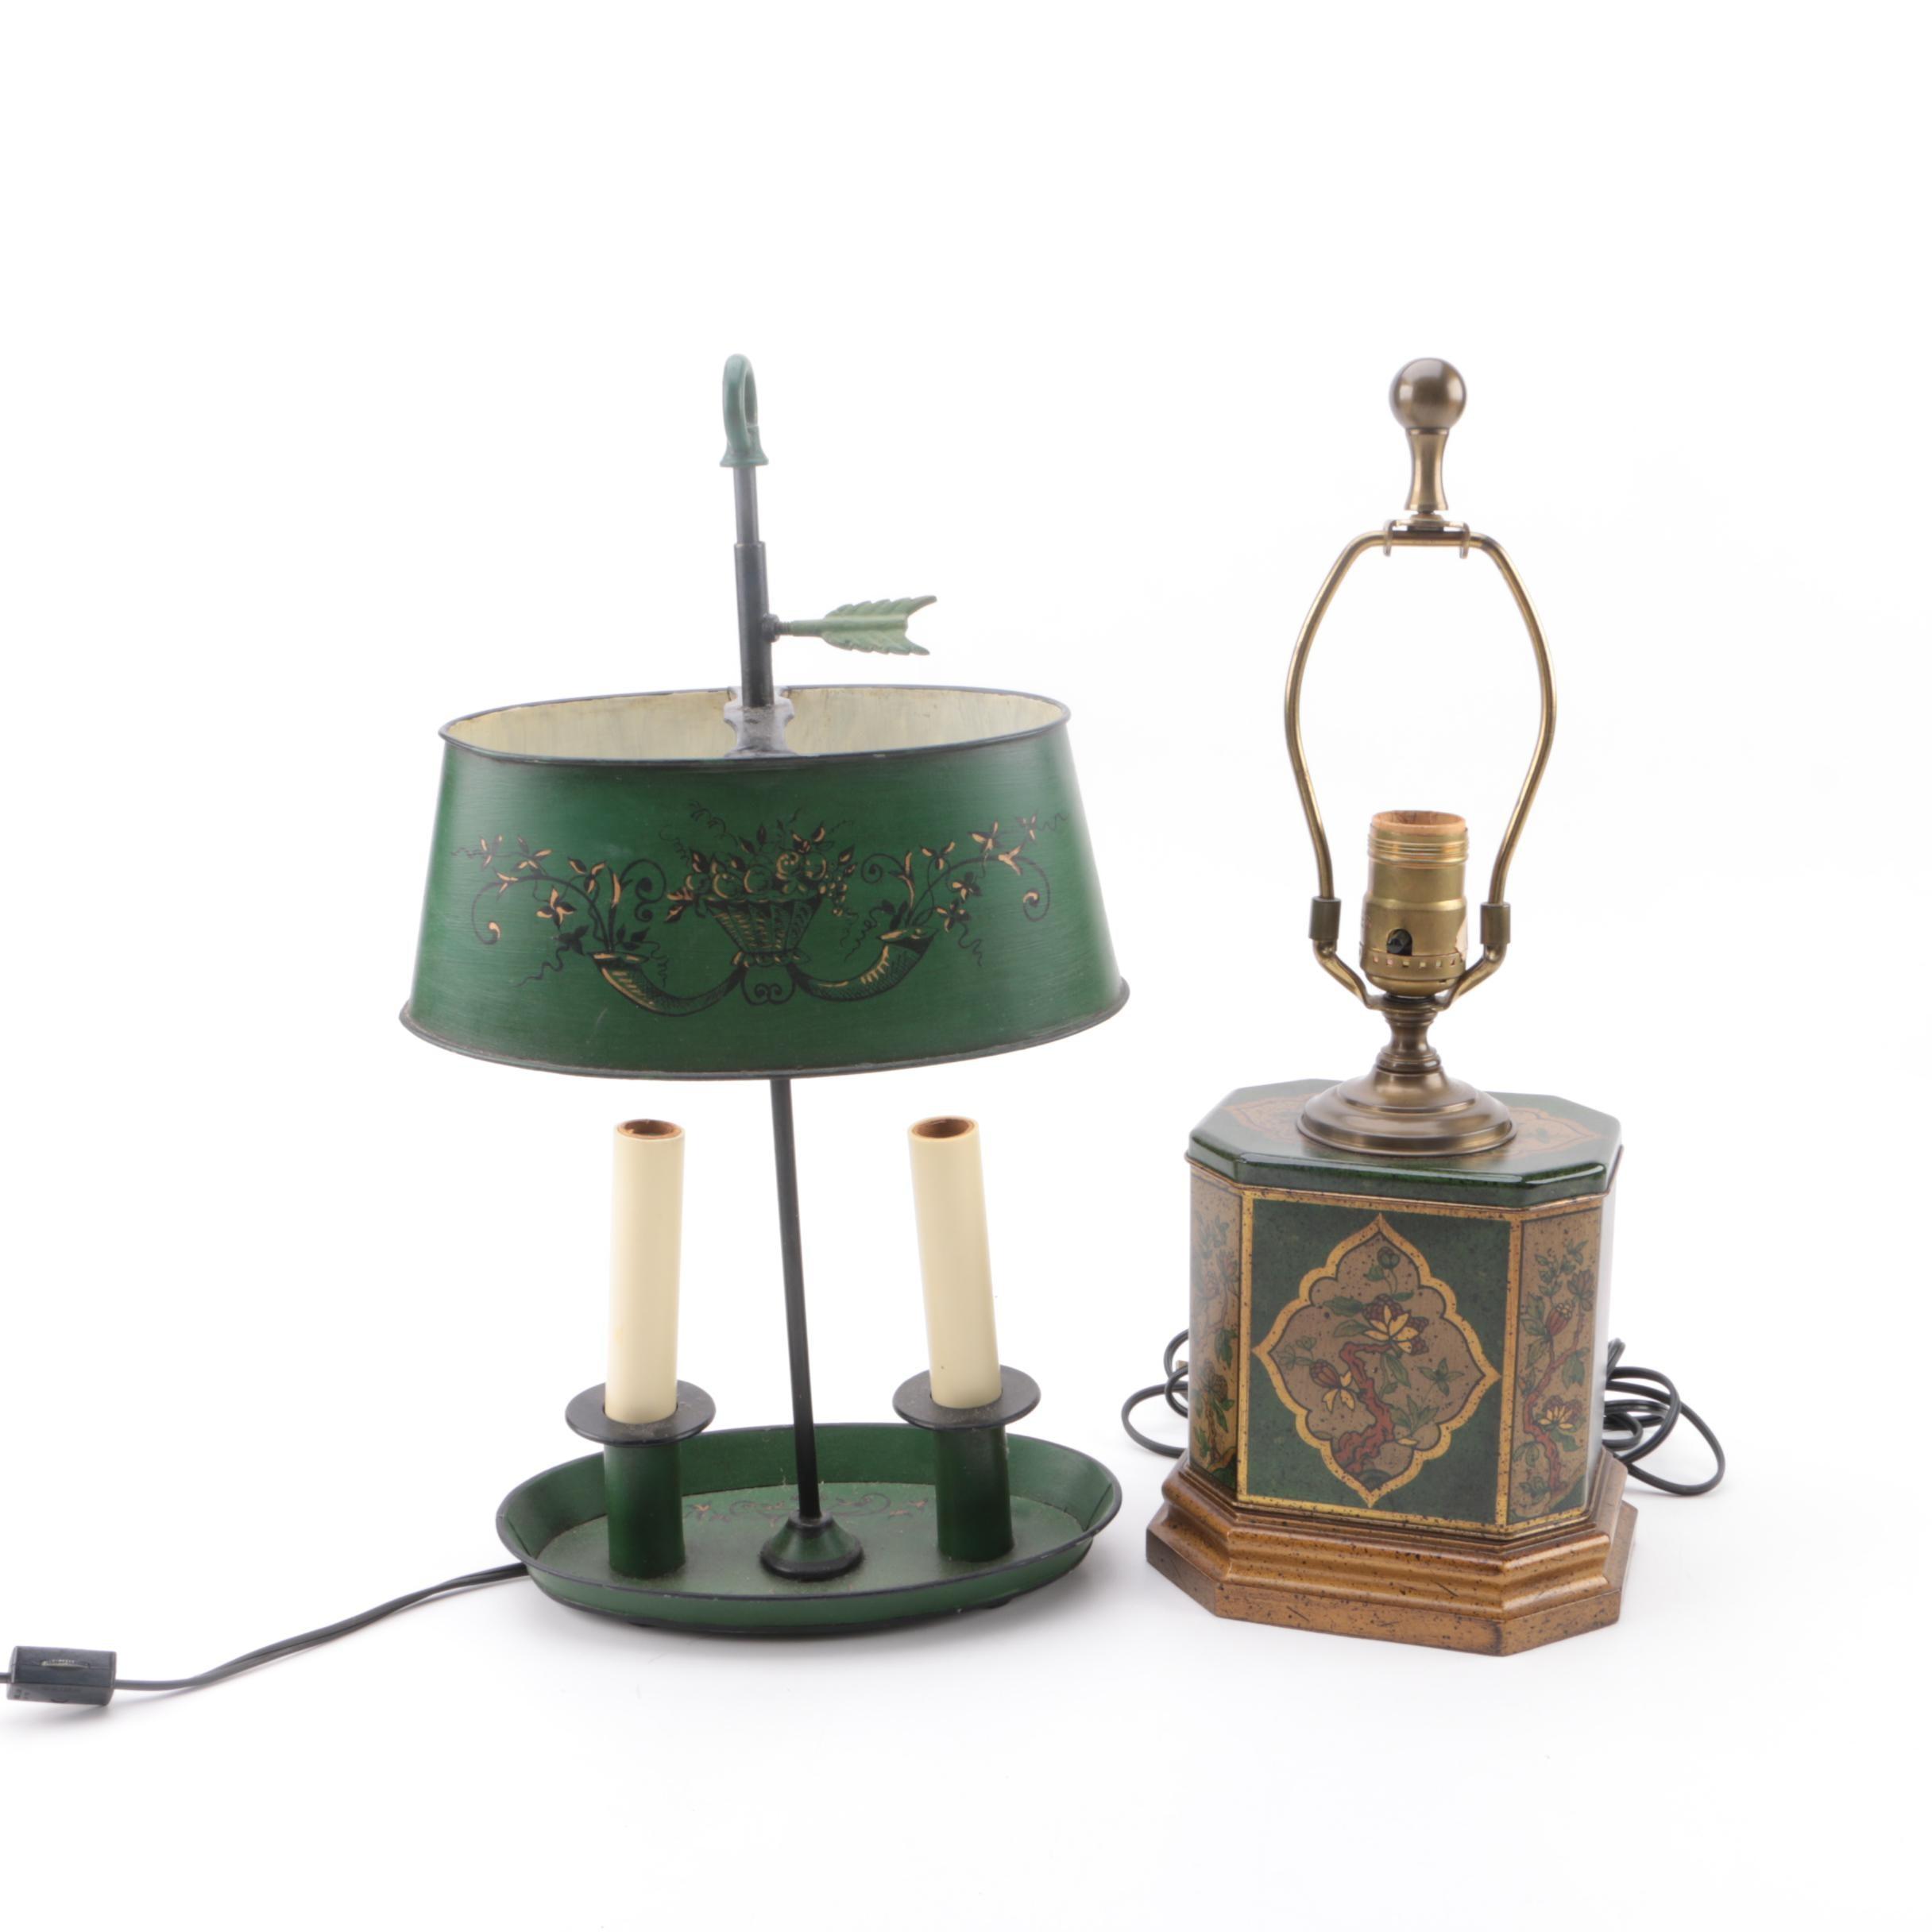 Vintage Table Lamps including Chapman Bouillotte Lamp